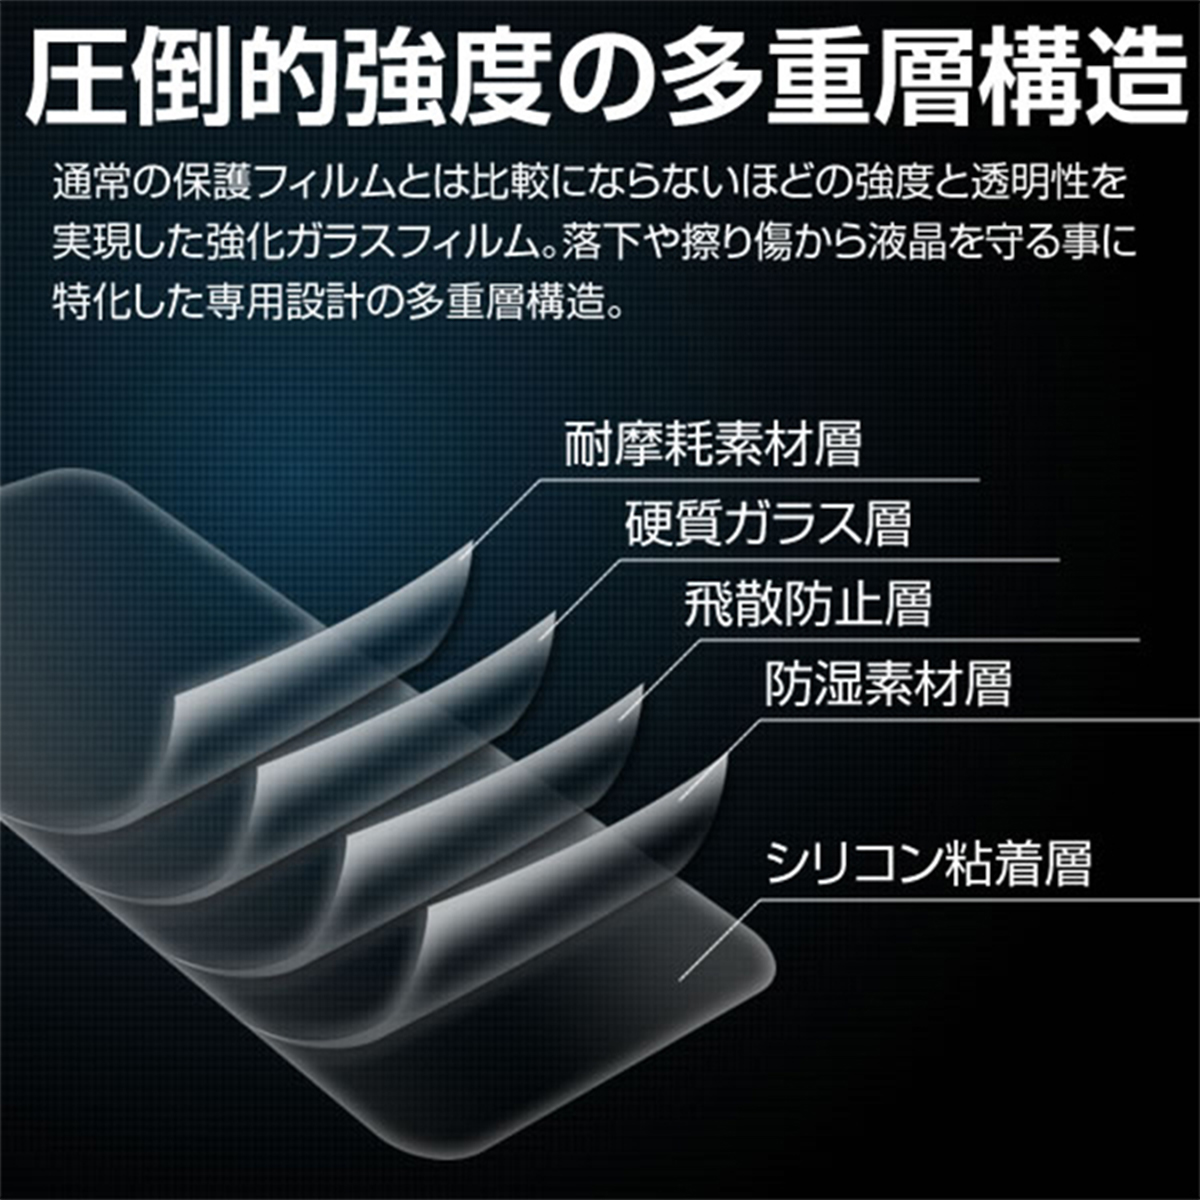 Xiaomi Mi Note 10 全面吸着カラー強化ガラス保護フィルム 9H